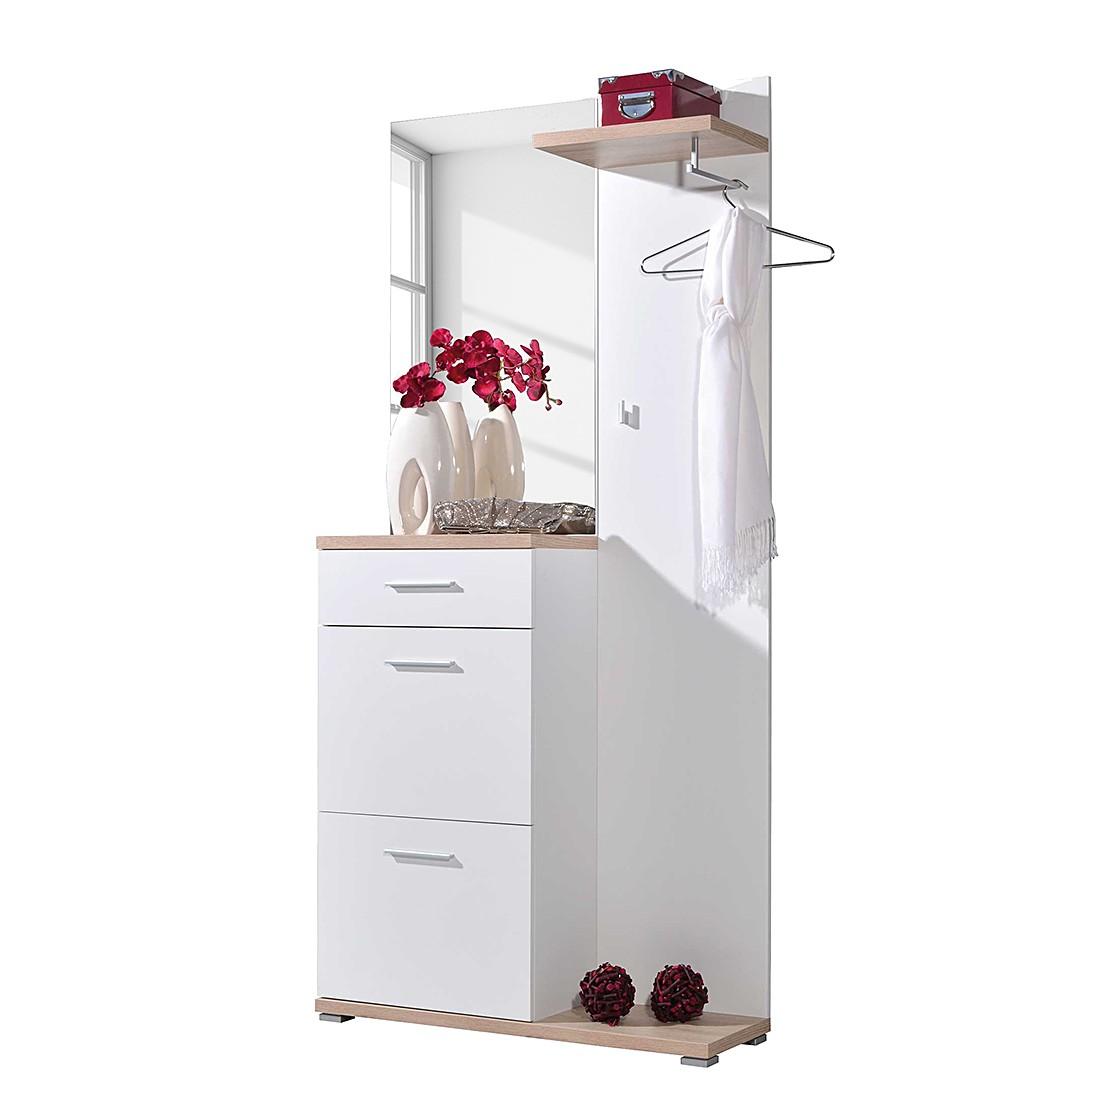 Halmeubel hoogglans wit 70x30cm aspect design aanbieding kopen for Aspect design